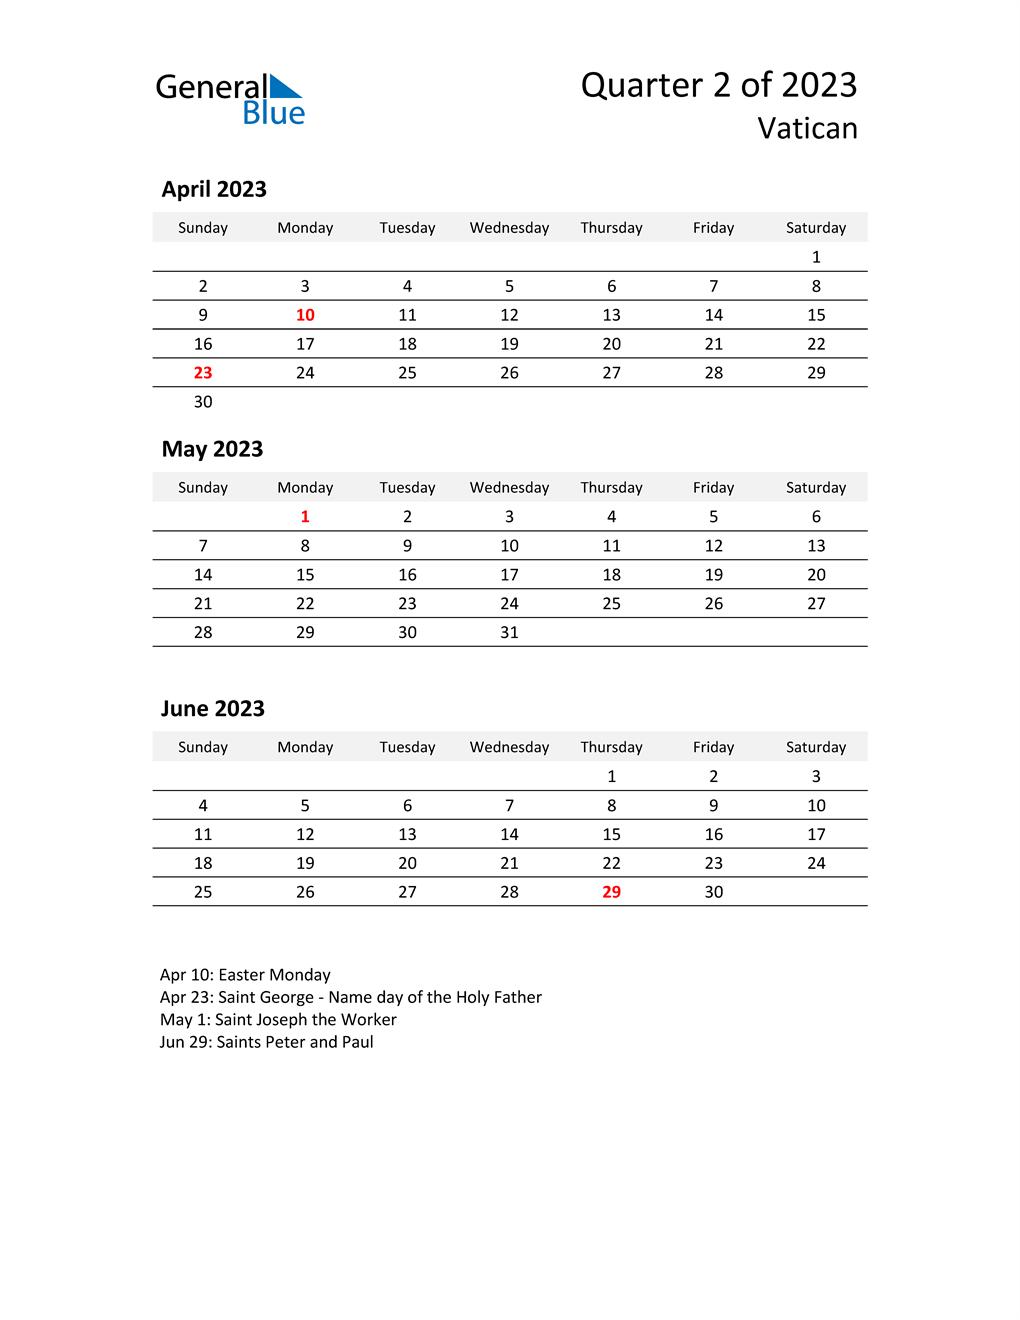 2023 Three-Month Calendar for Vatican